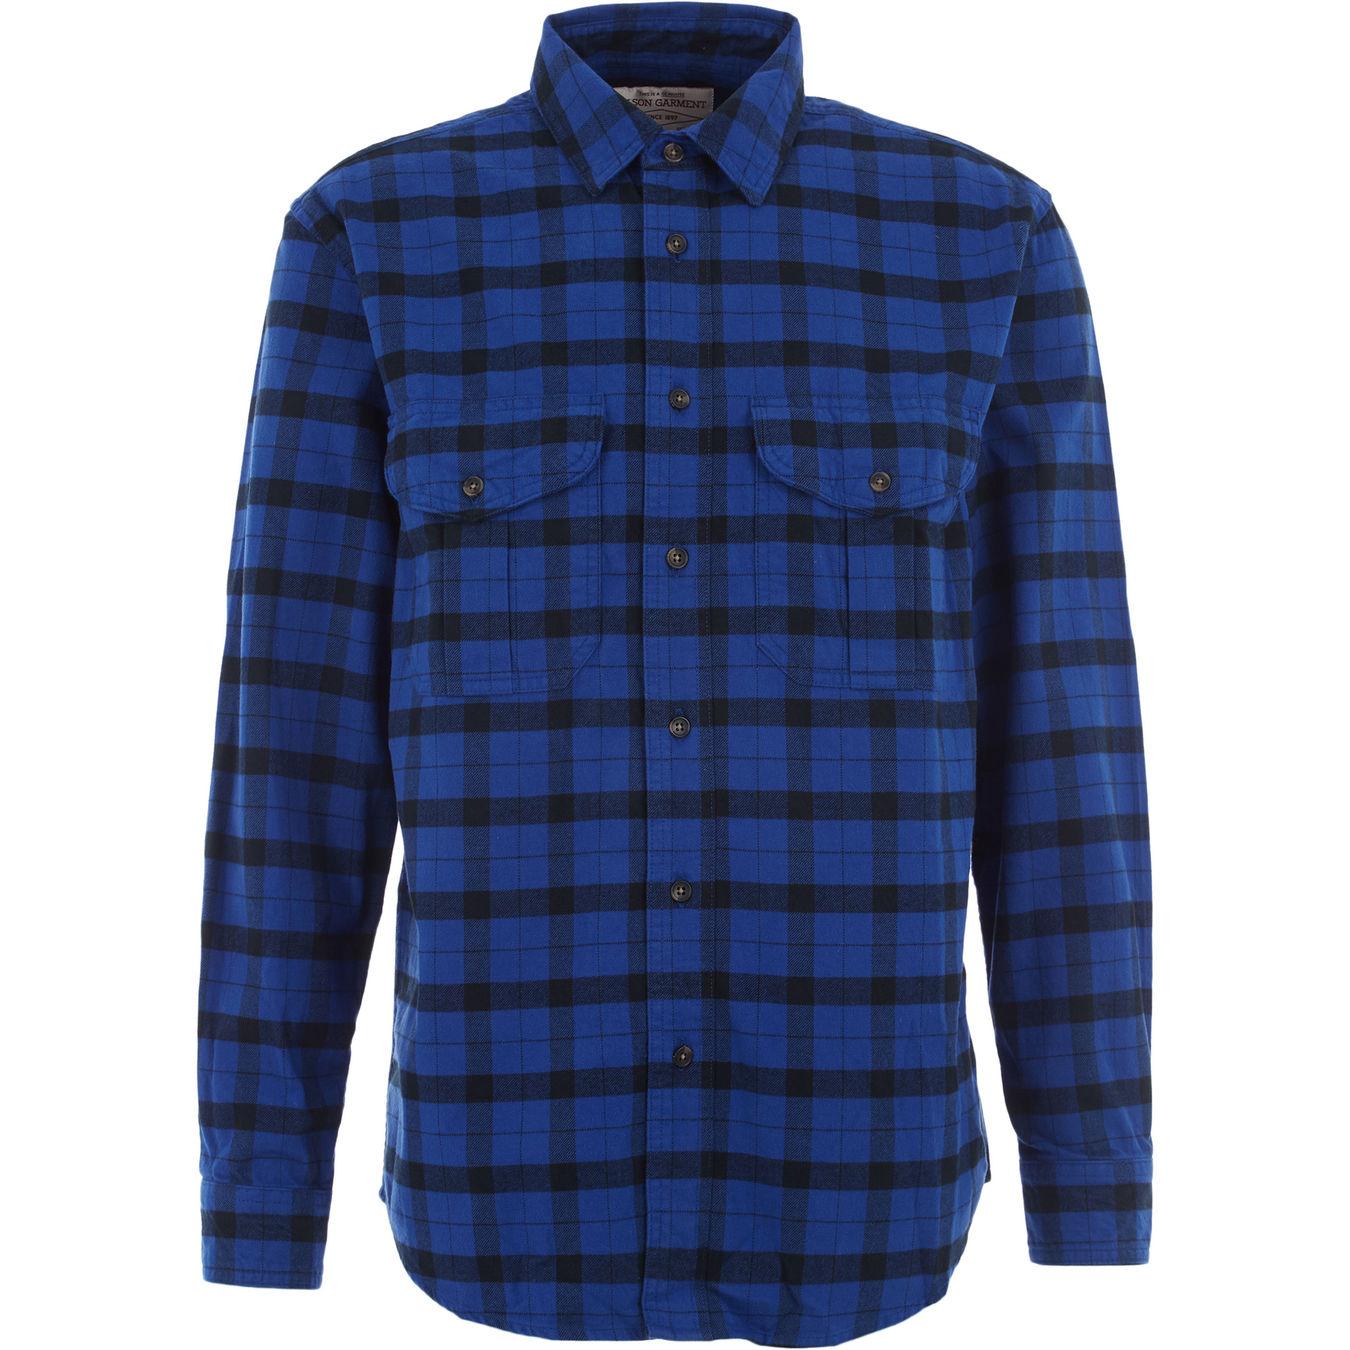 Filson Alaskan Guide Shirt £21 @ TK MAXX - £1.99 c&c